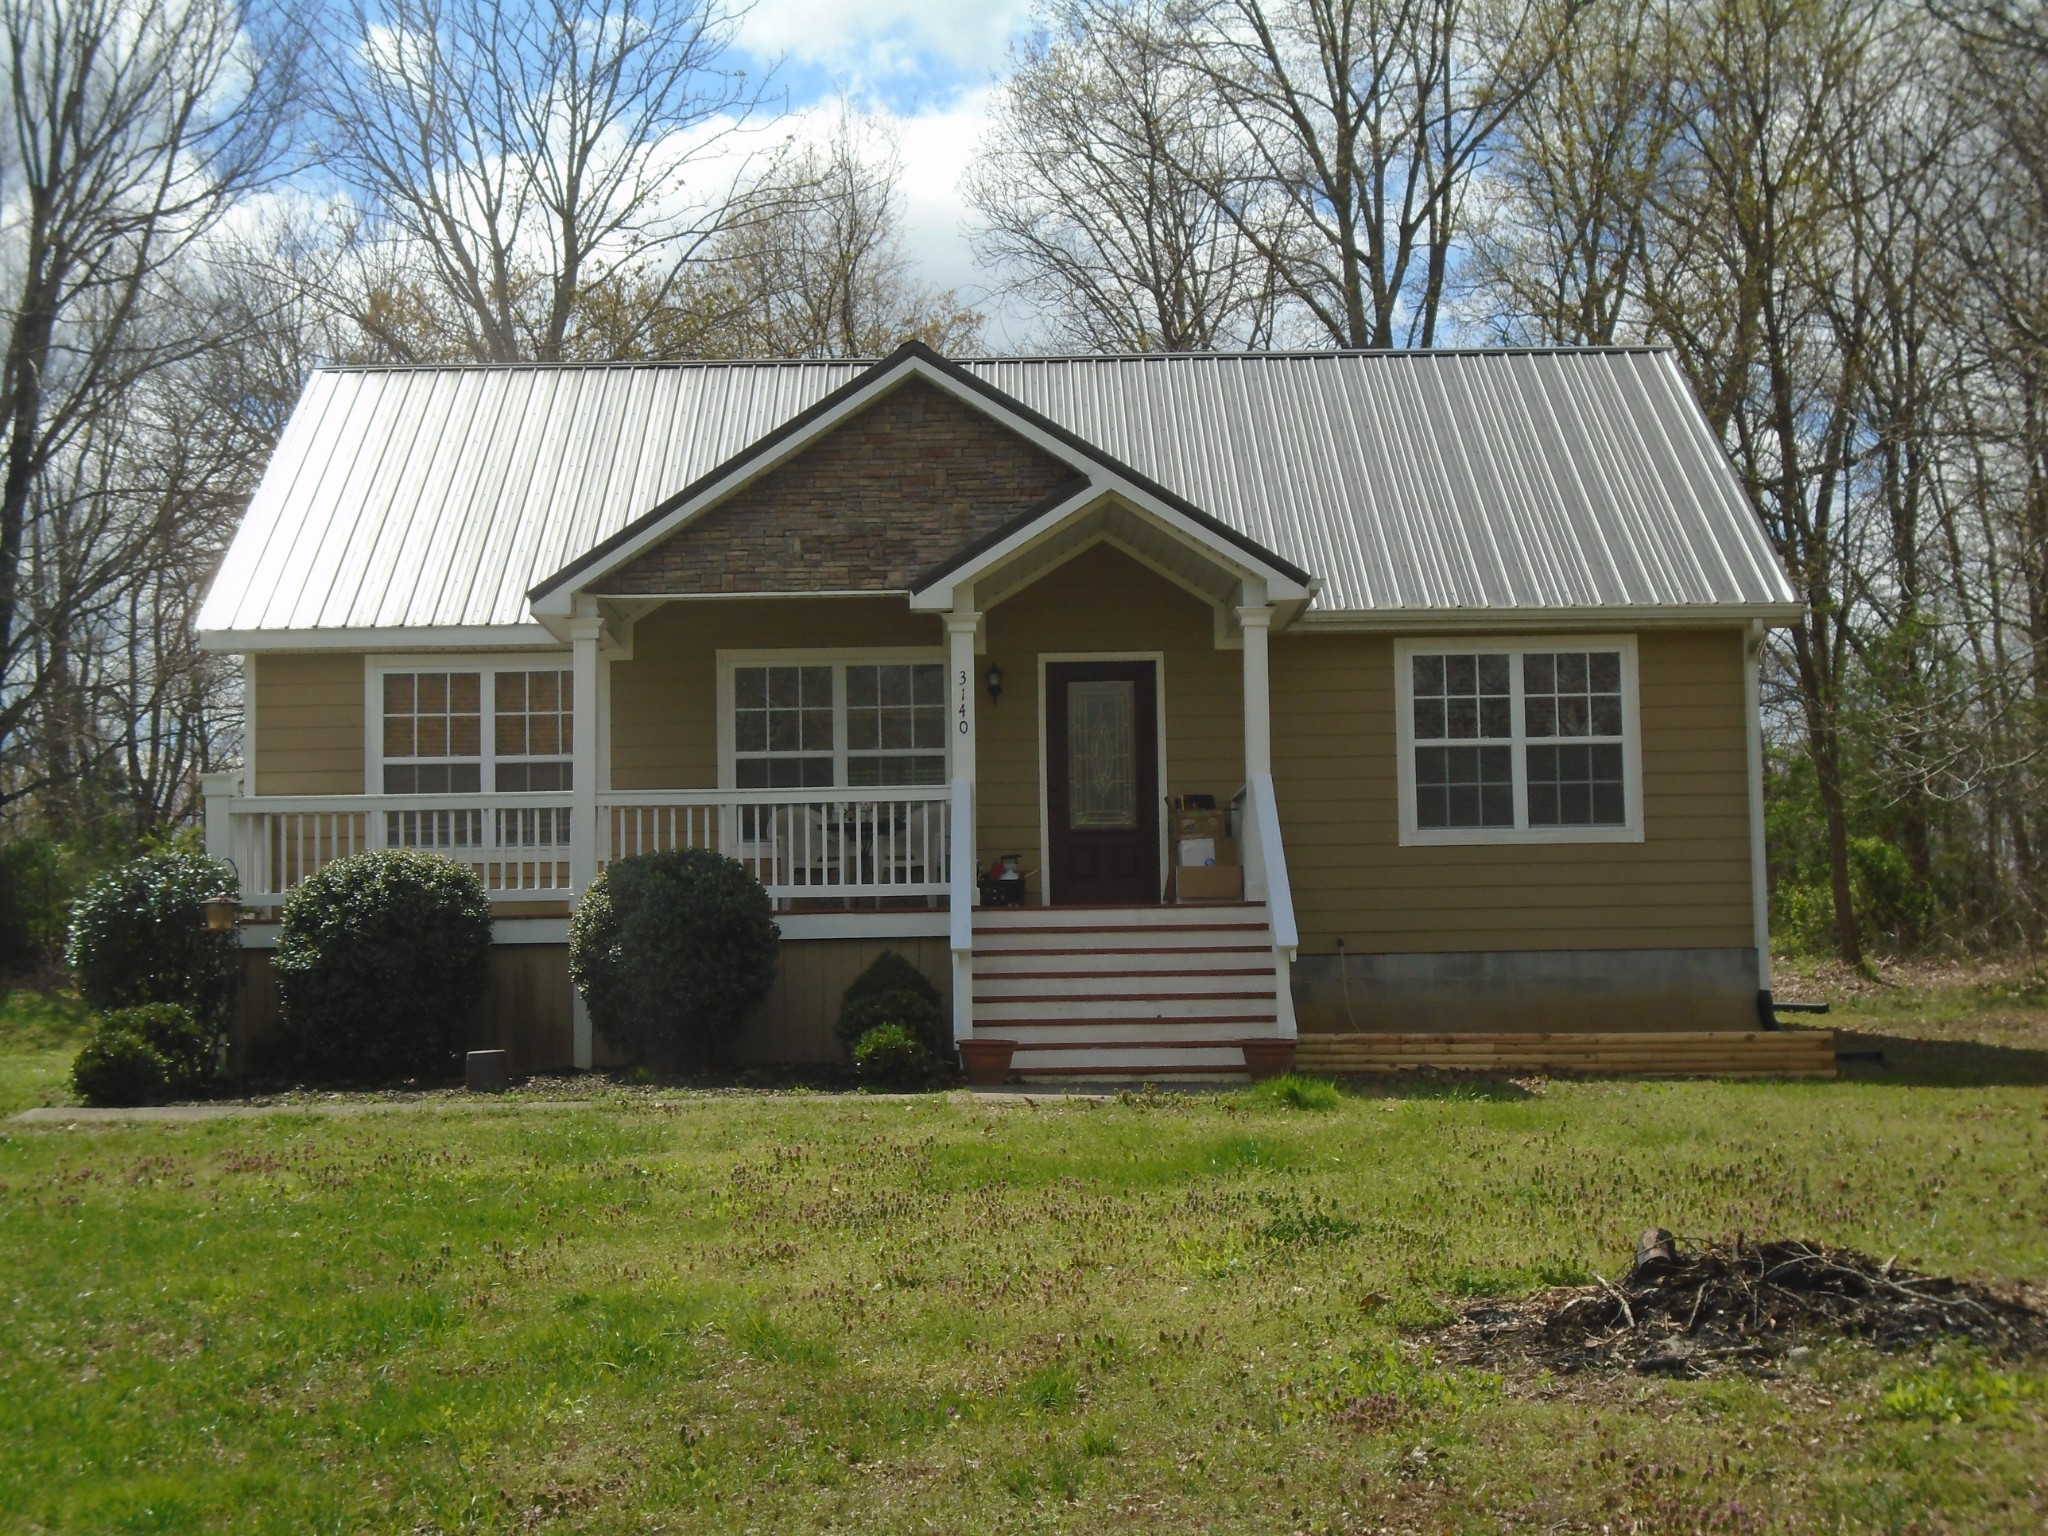 3140 Jernigan Branch Rd, Beechgrove, TN 37018 - Beechgrove, TN real estate listing